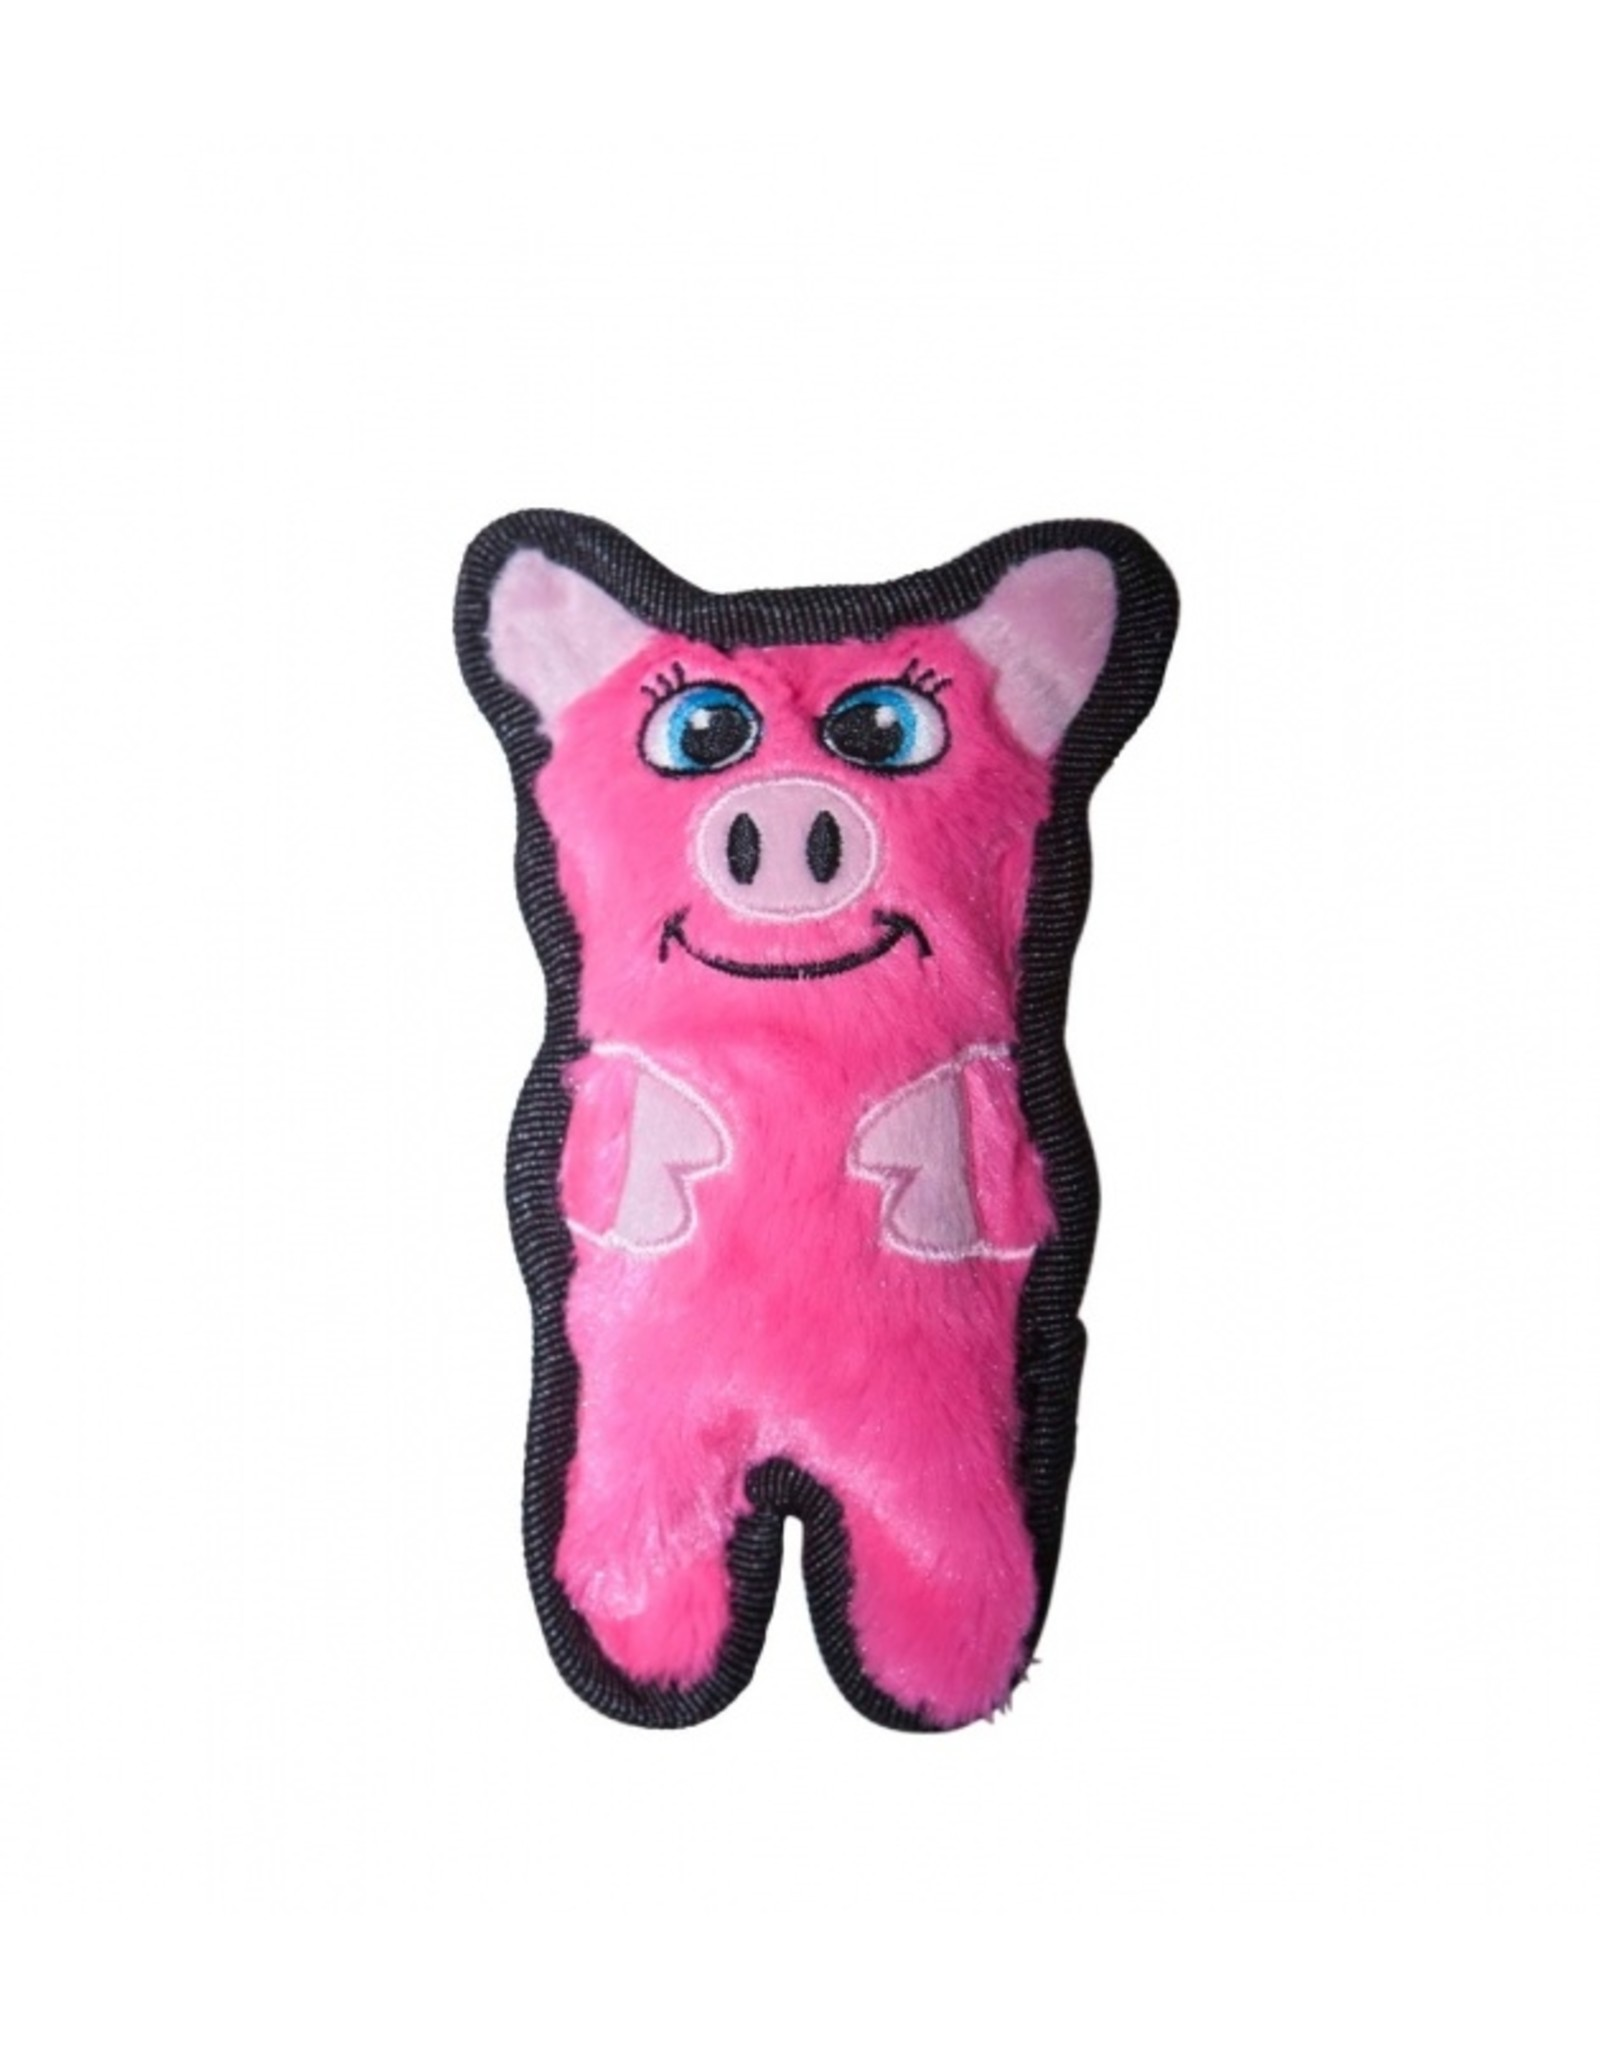 Outward Hound Outward Hound: Invincible Pig Mini